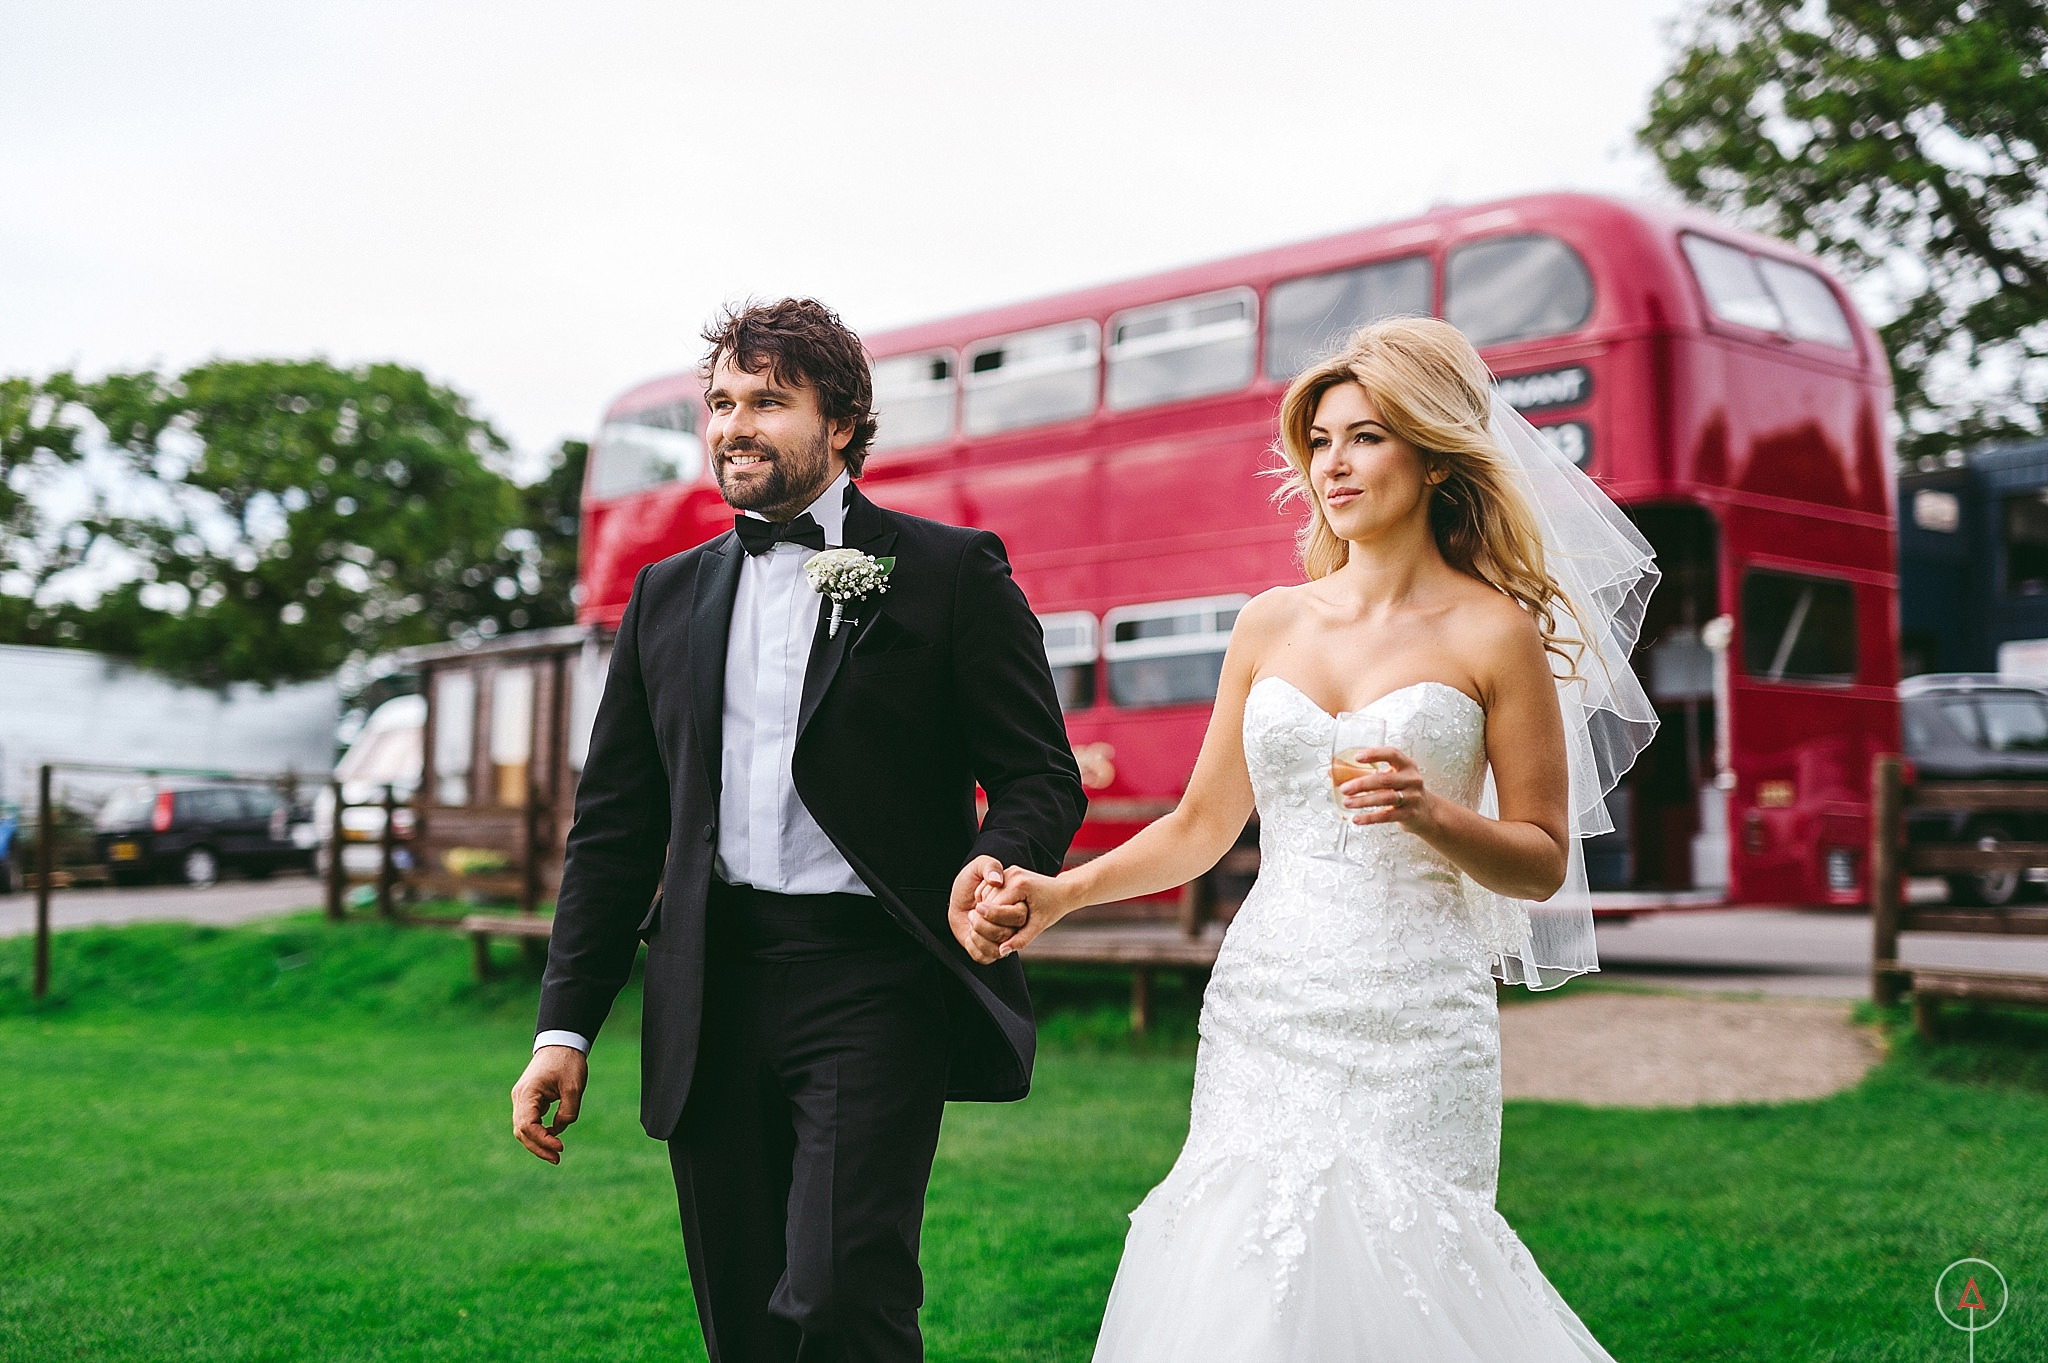 cardiff-wedding-photographer-aga-tomaszek_0387